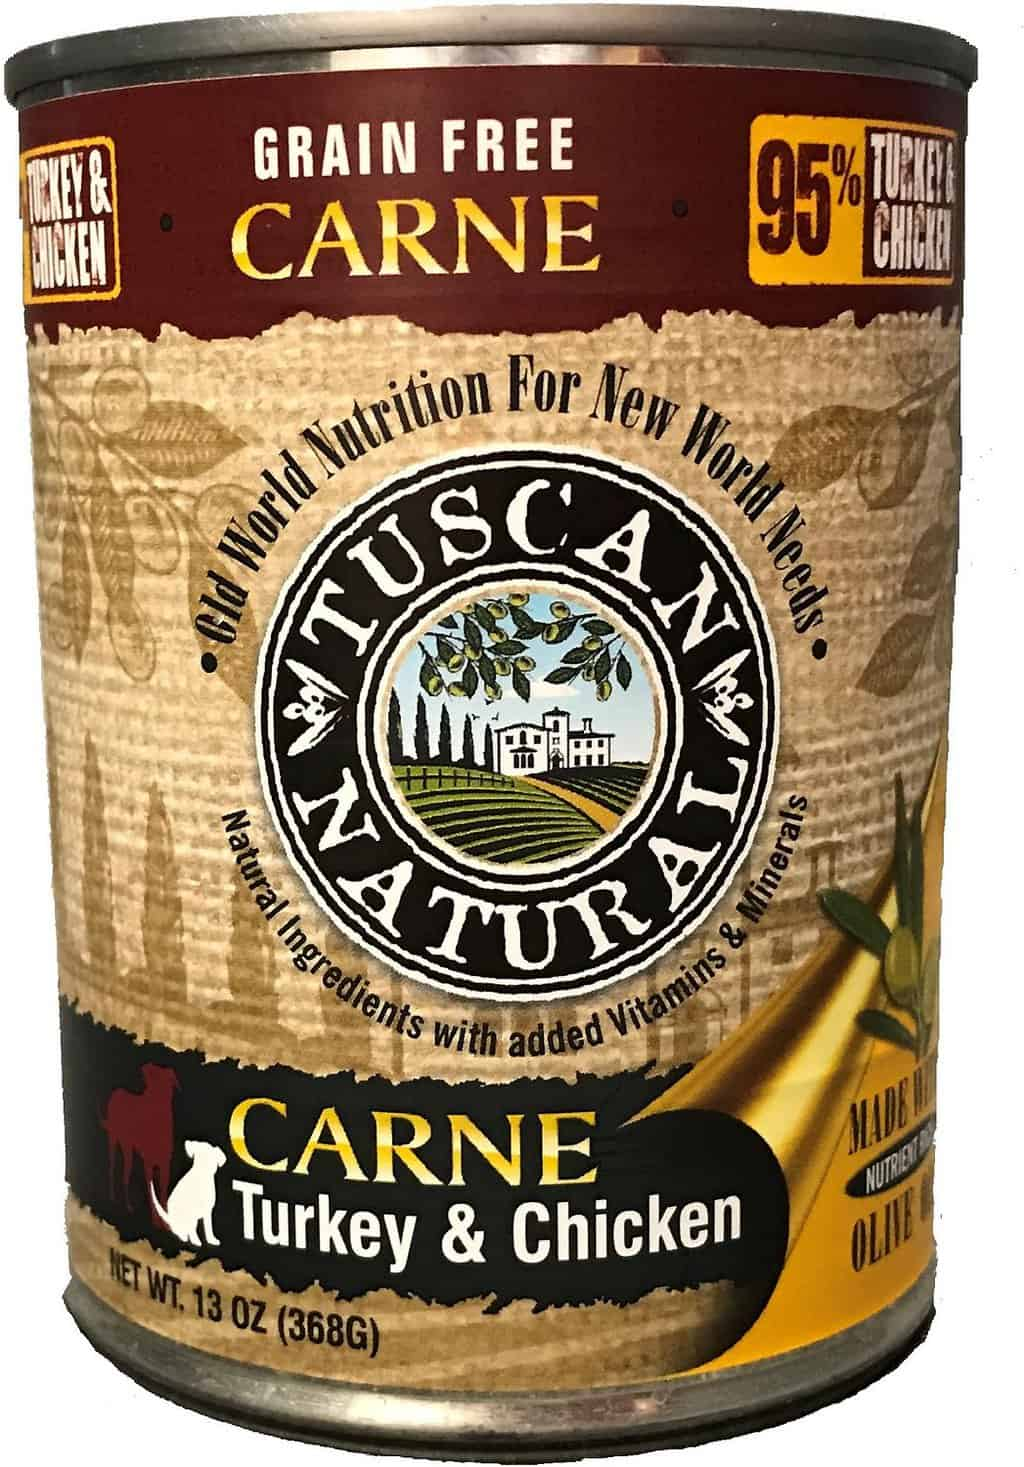 Tuscan Natural Dog Food: 2021 Reviews, Recalls & Coupons 11